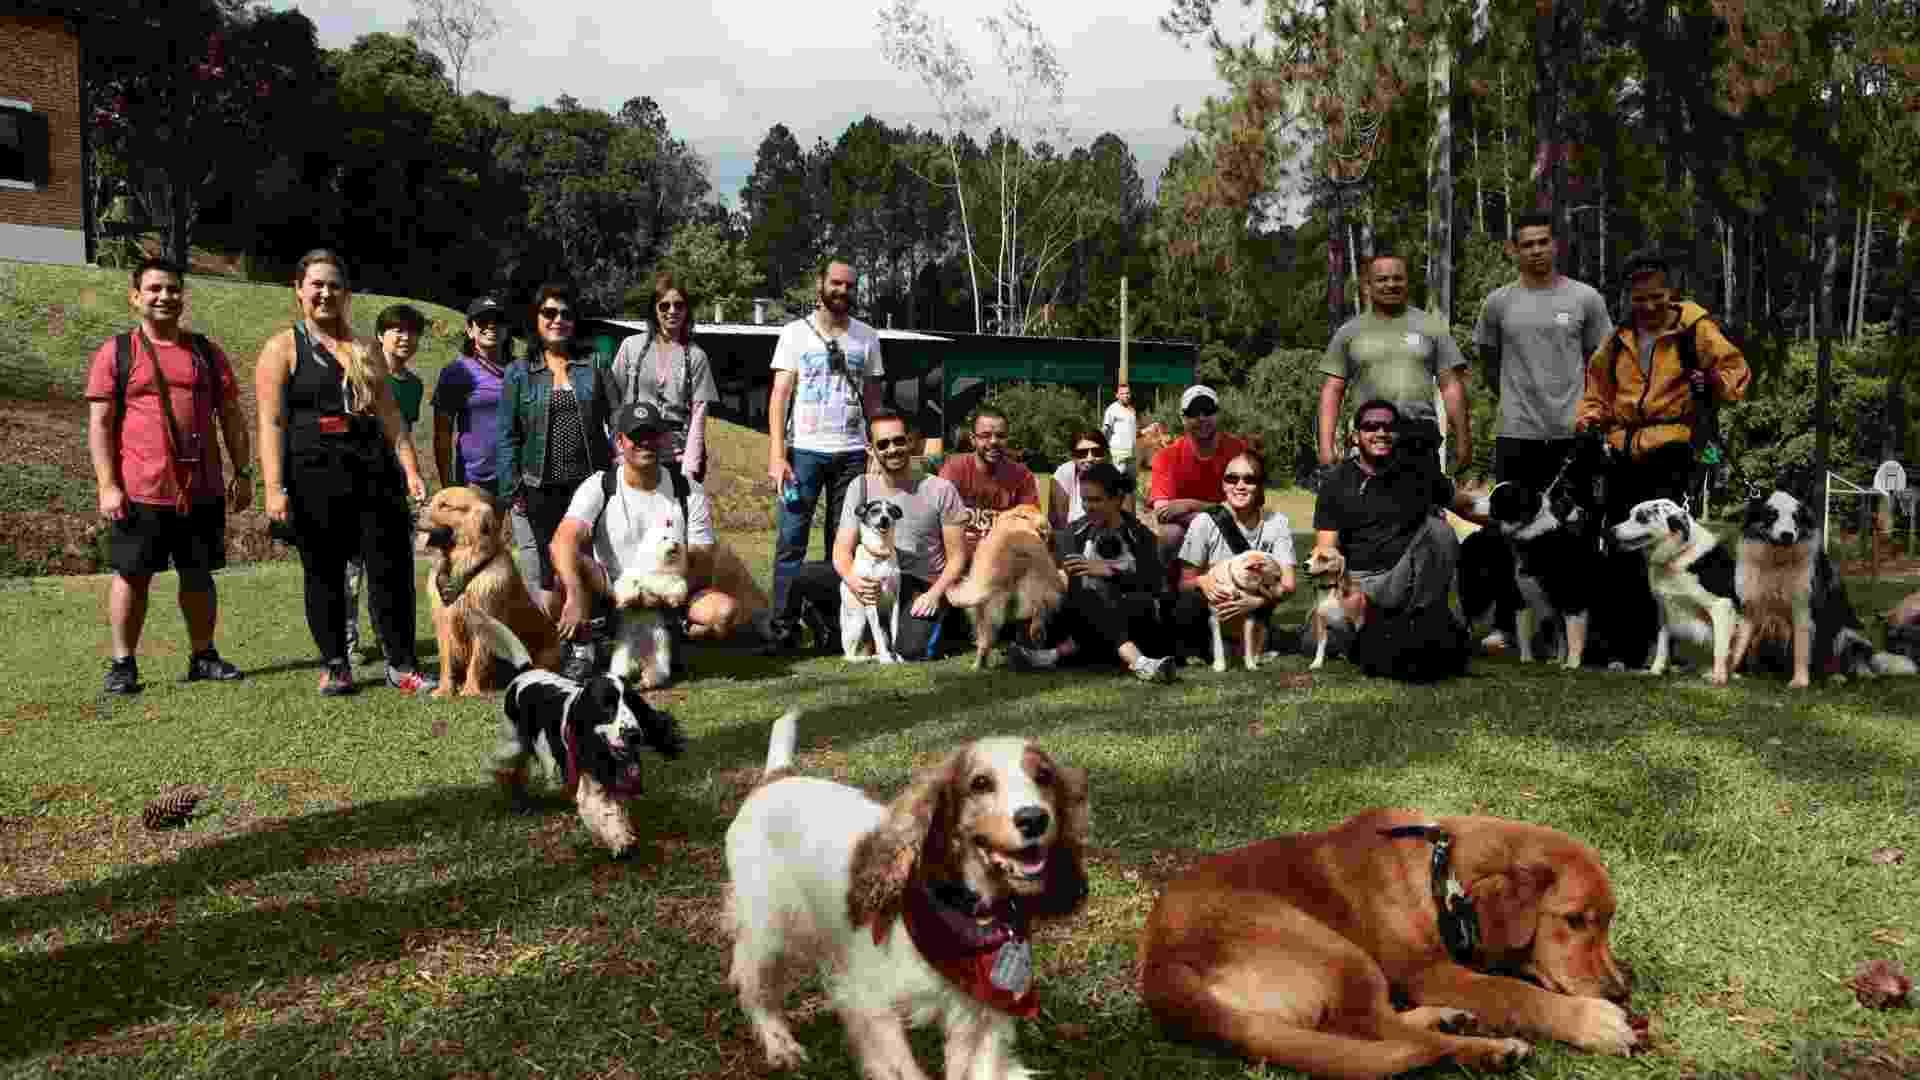 Trilha com cães - Monalisa Lins/BOL